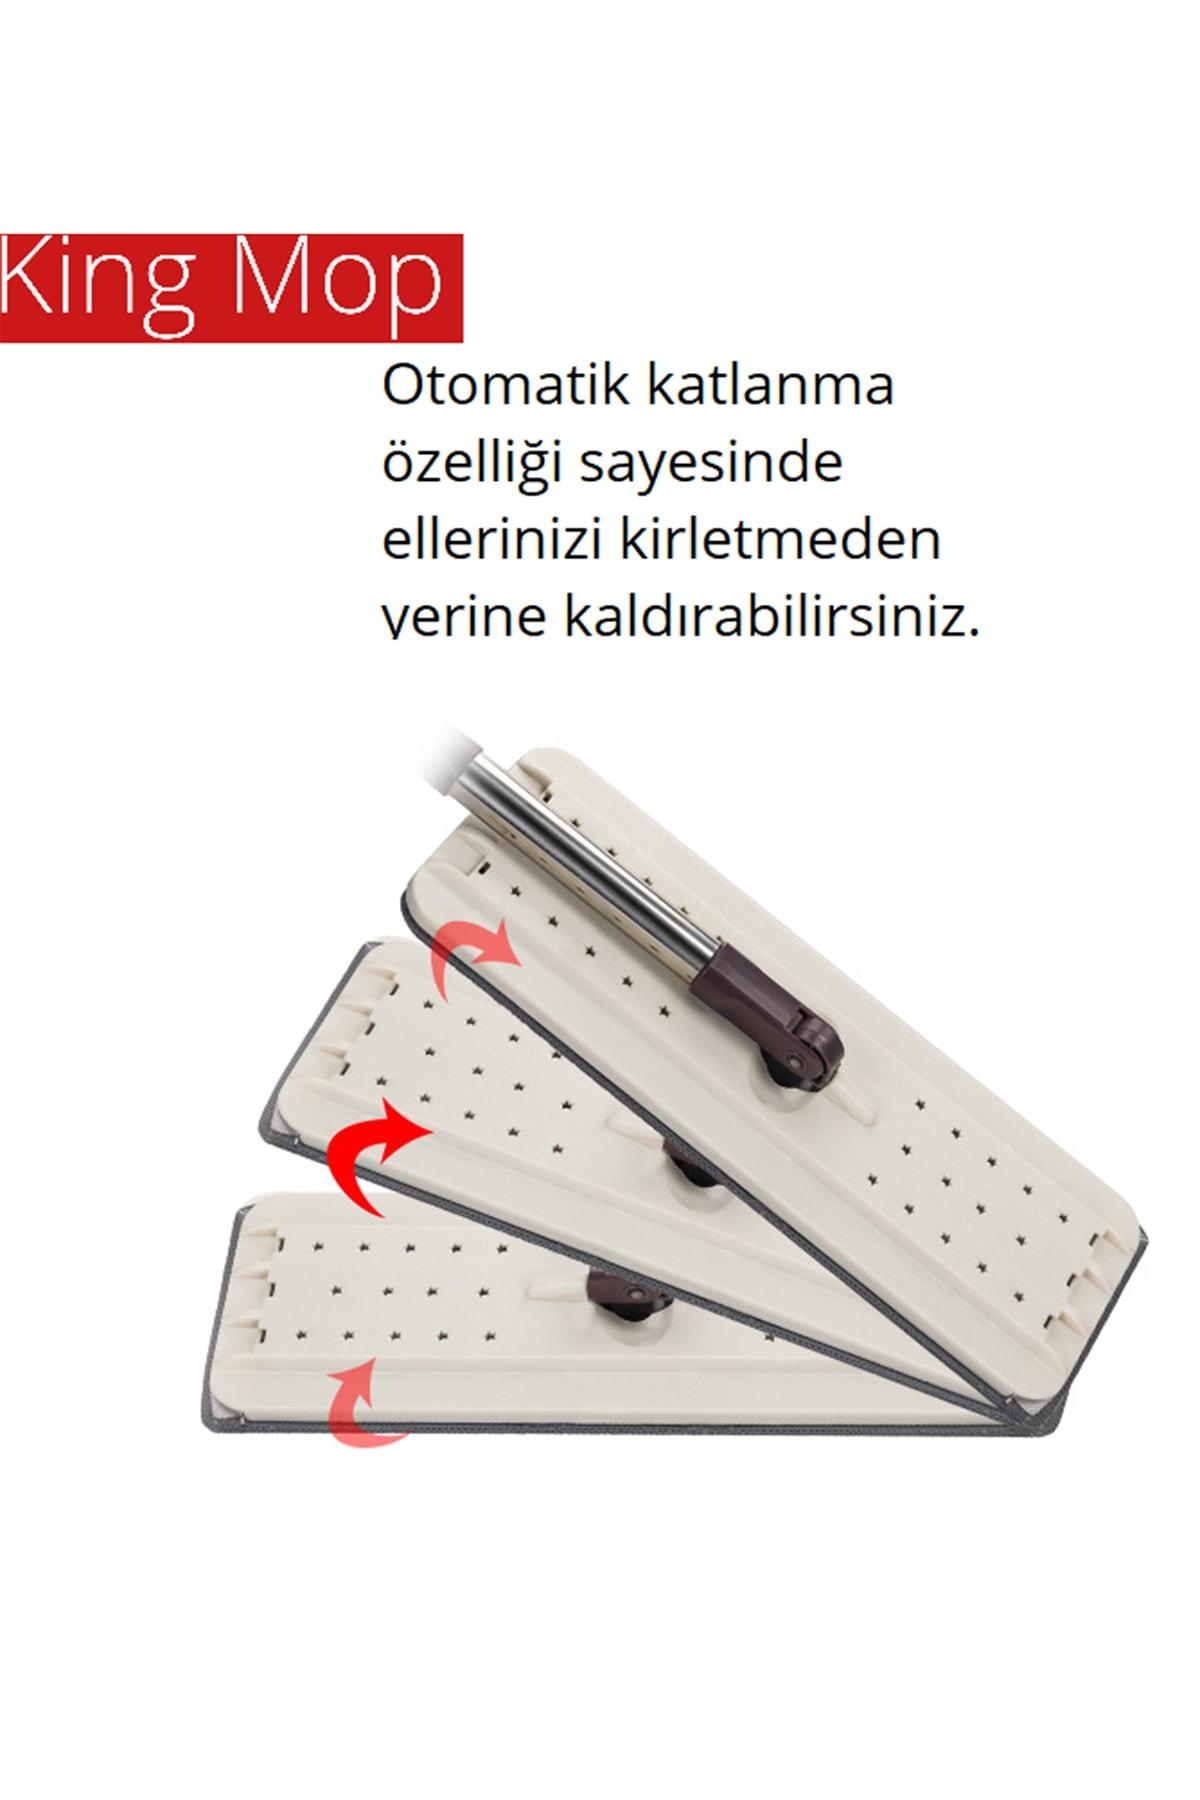 King Mop Tablet Mop 4 4 Litre Paspas Mop Temizlik Seti